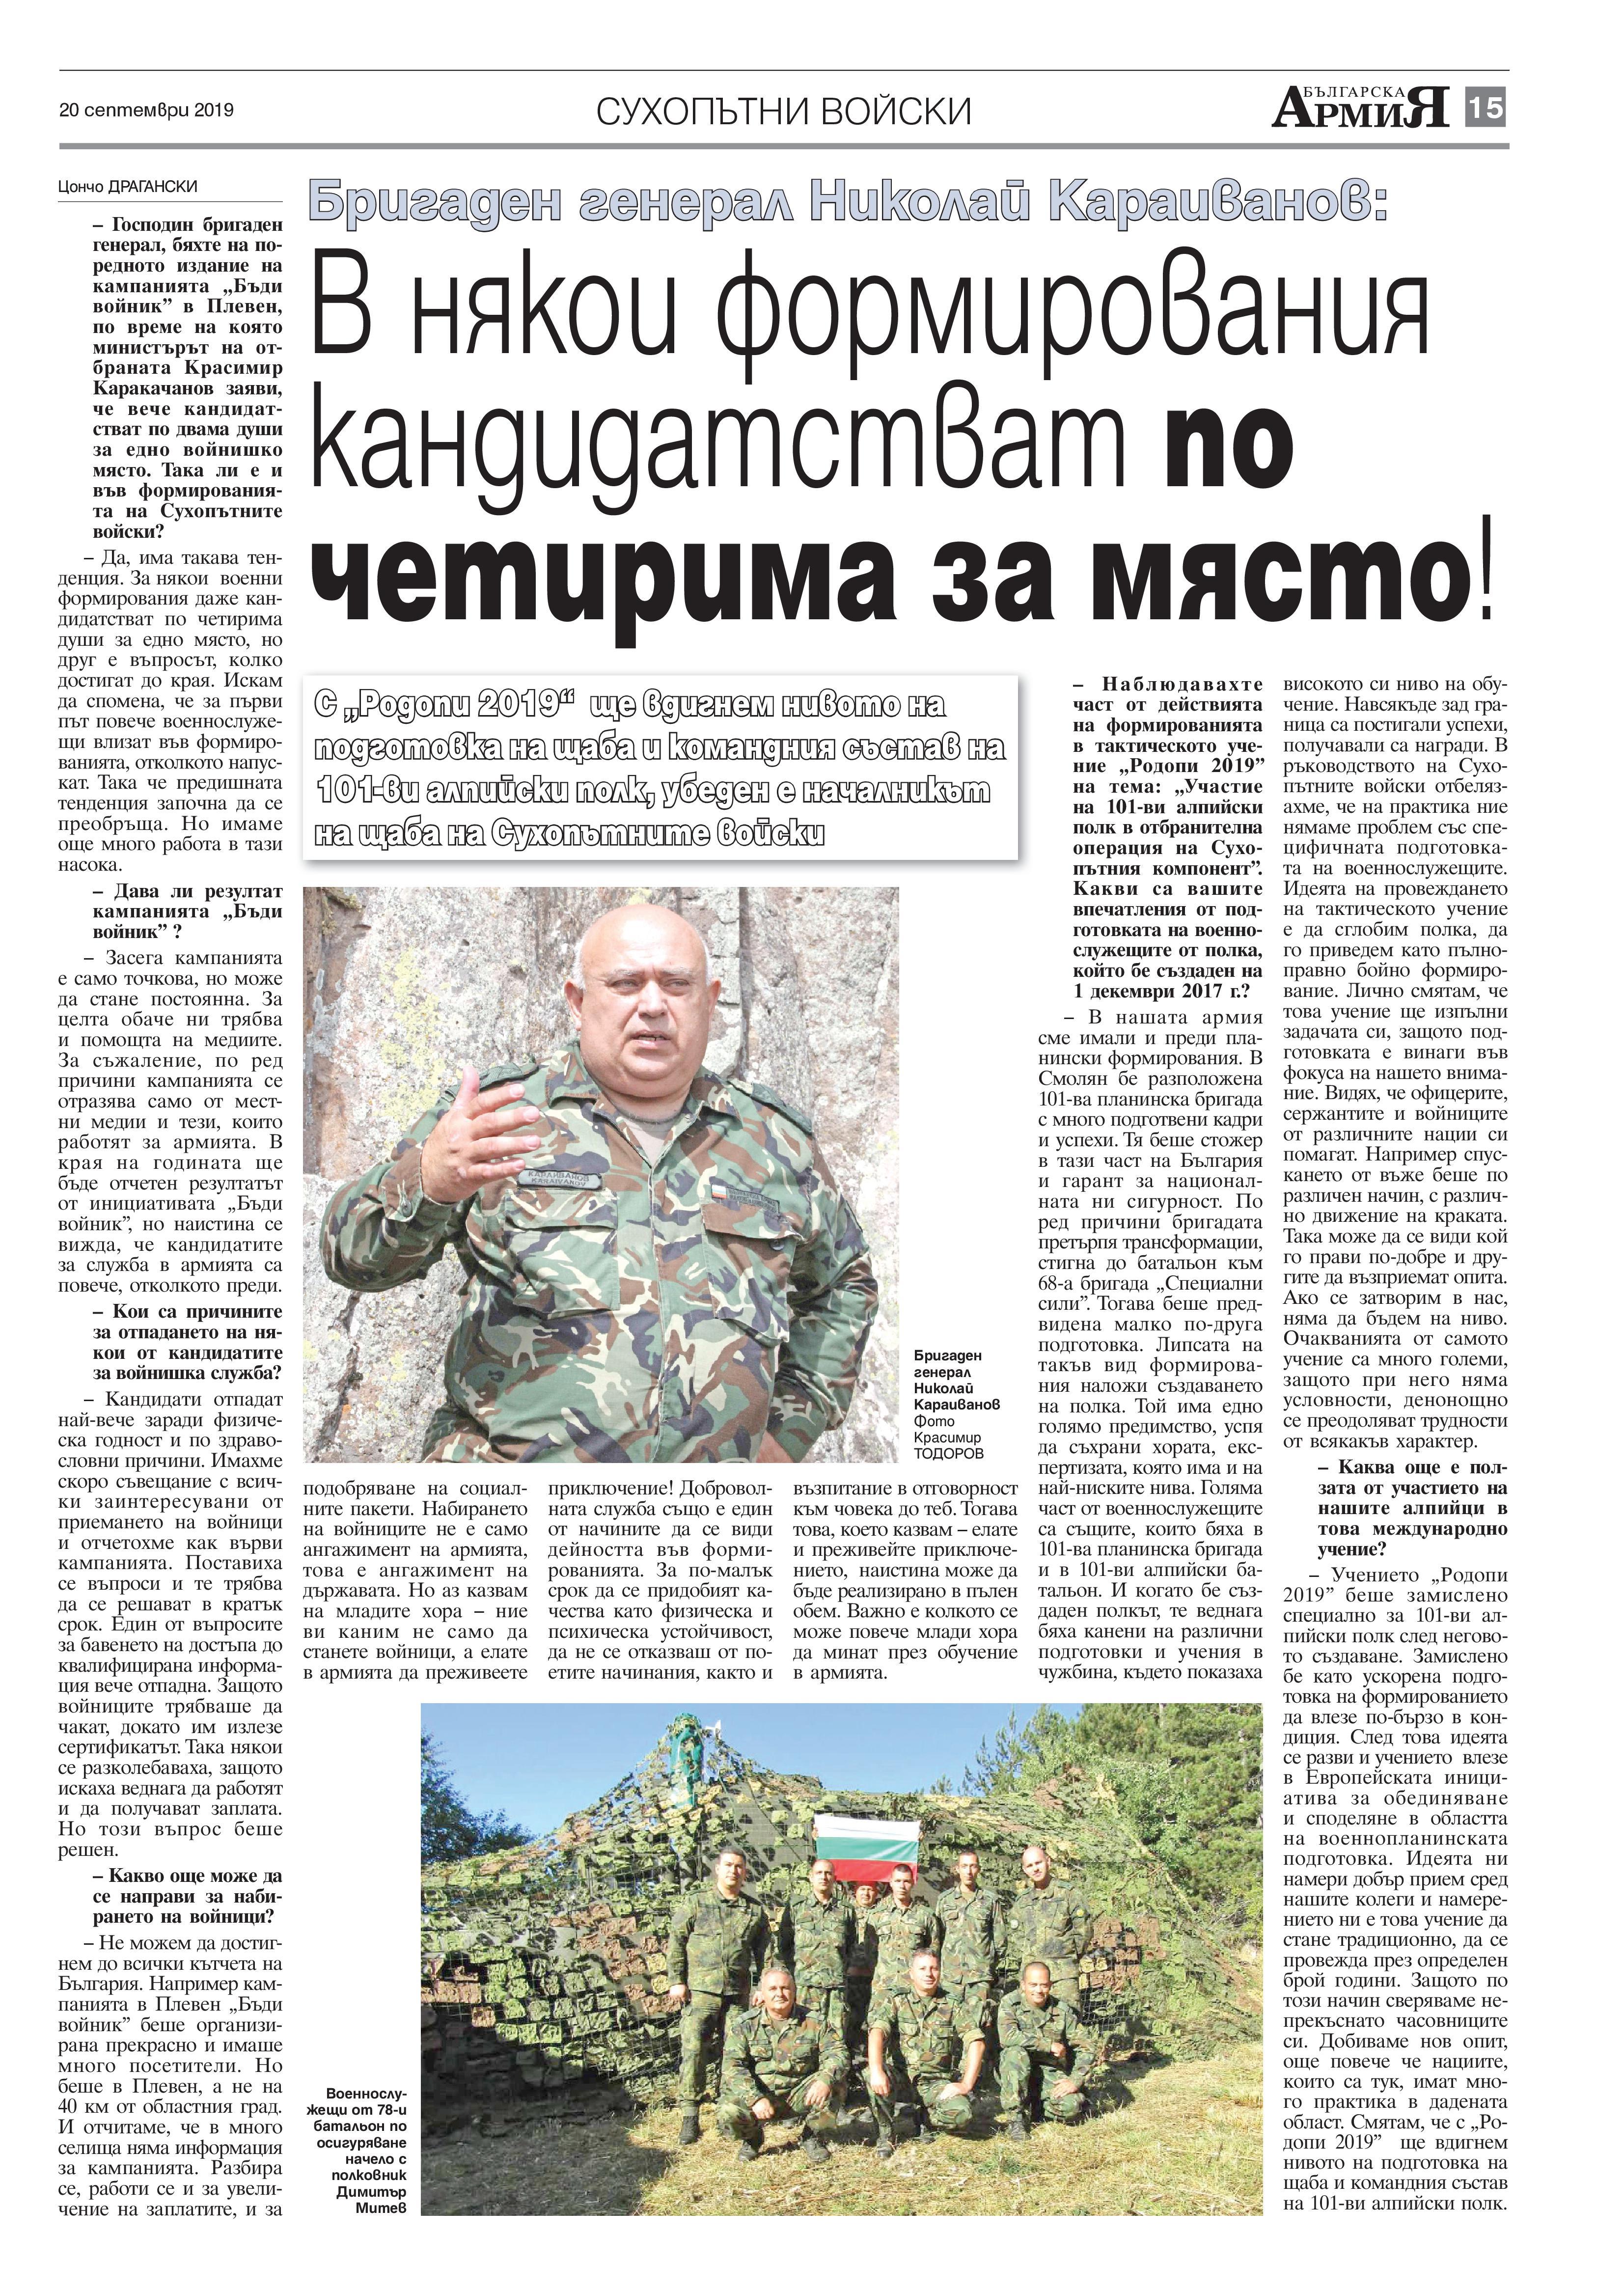 https://armymedia.bg/wp-content/uploads/2015/06/15-32.jpg